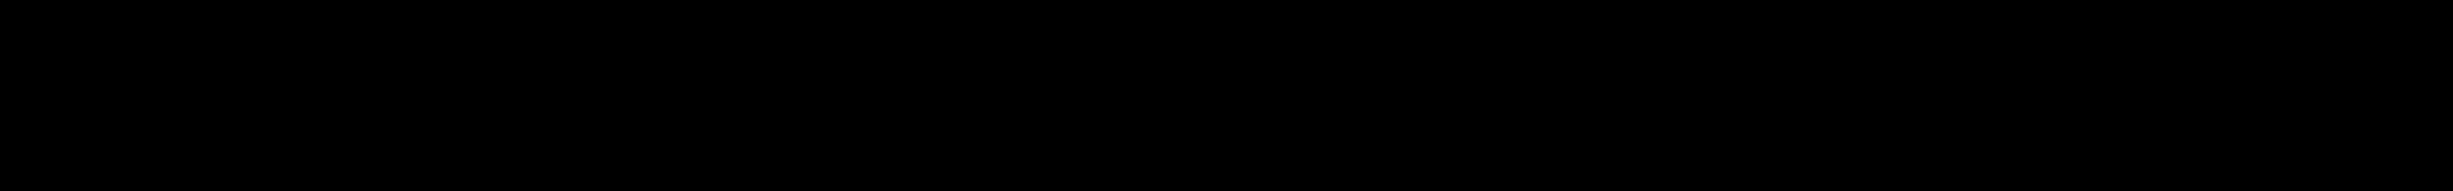 Gasoline Serif BTN Oblique